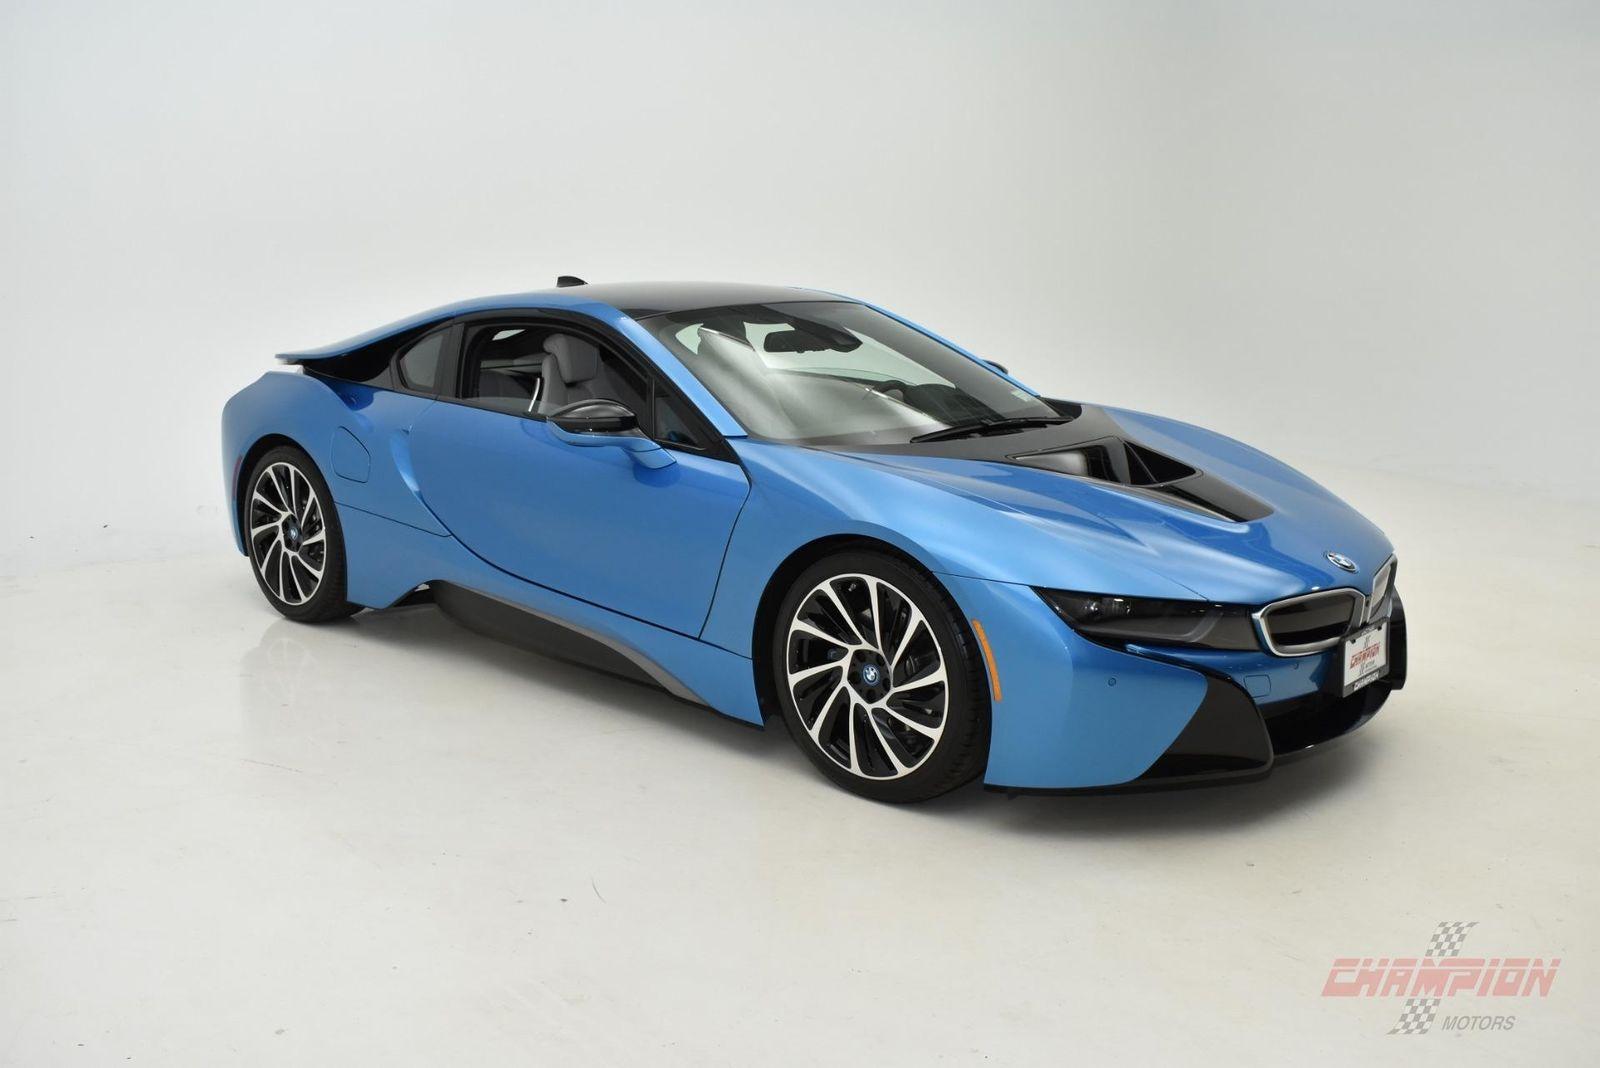 Amazing 2015 Bmw I8 2015 Bmw I8 3 386 Miles Protonic Blue Metallic